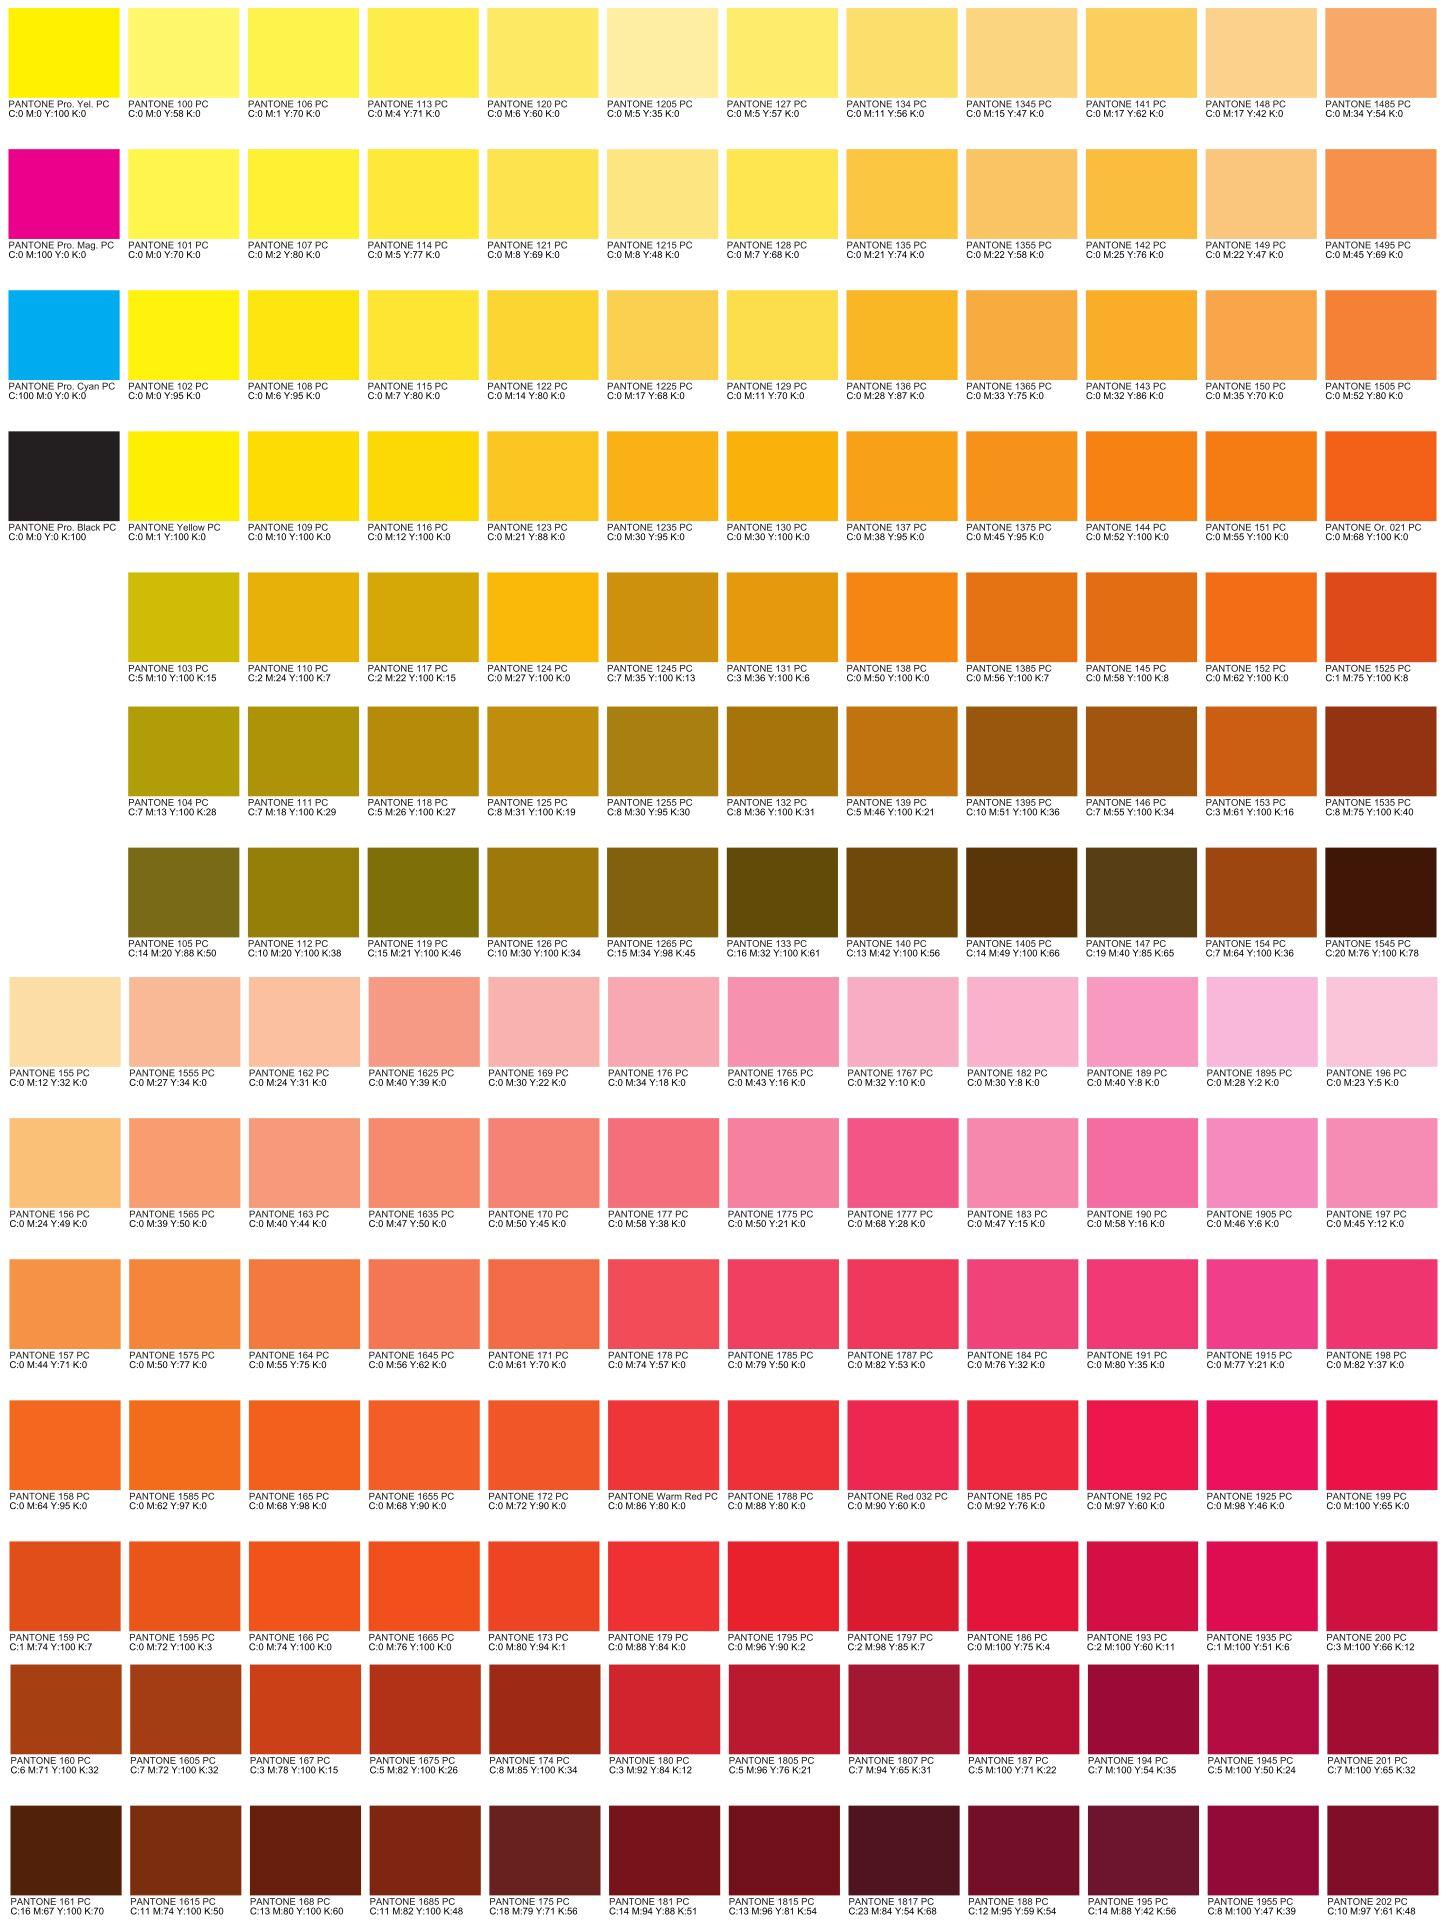 CMYK color code charts Love my job Pinterest